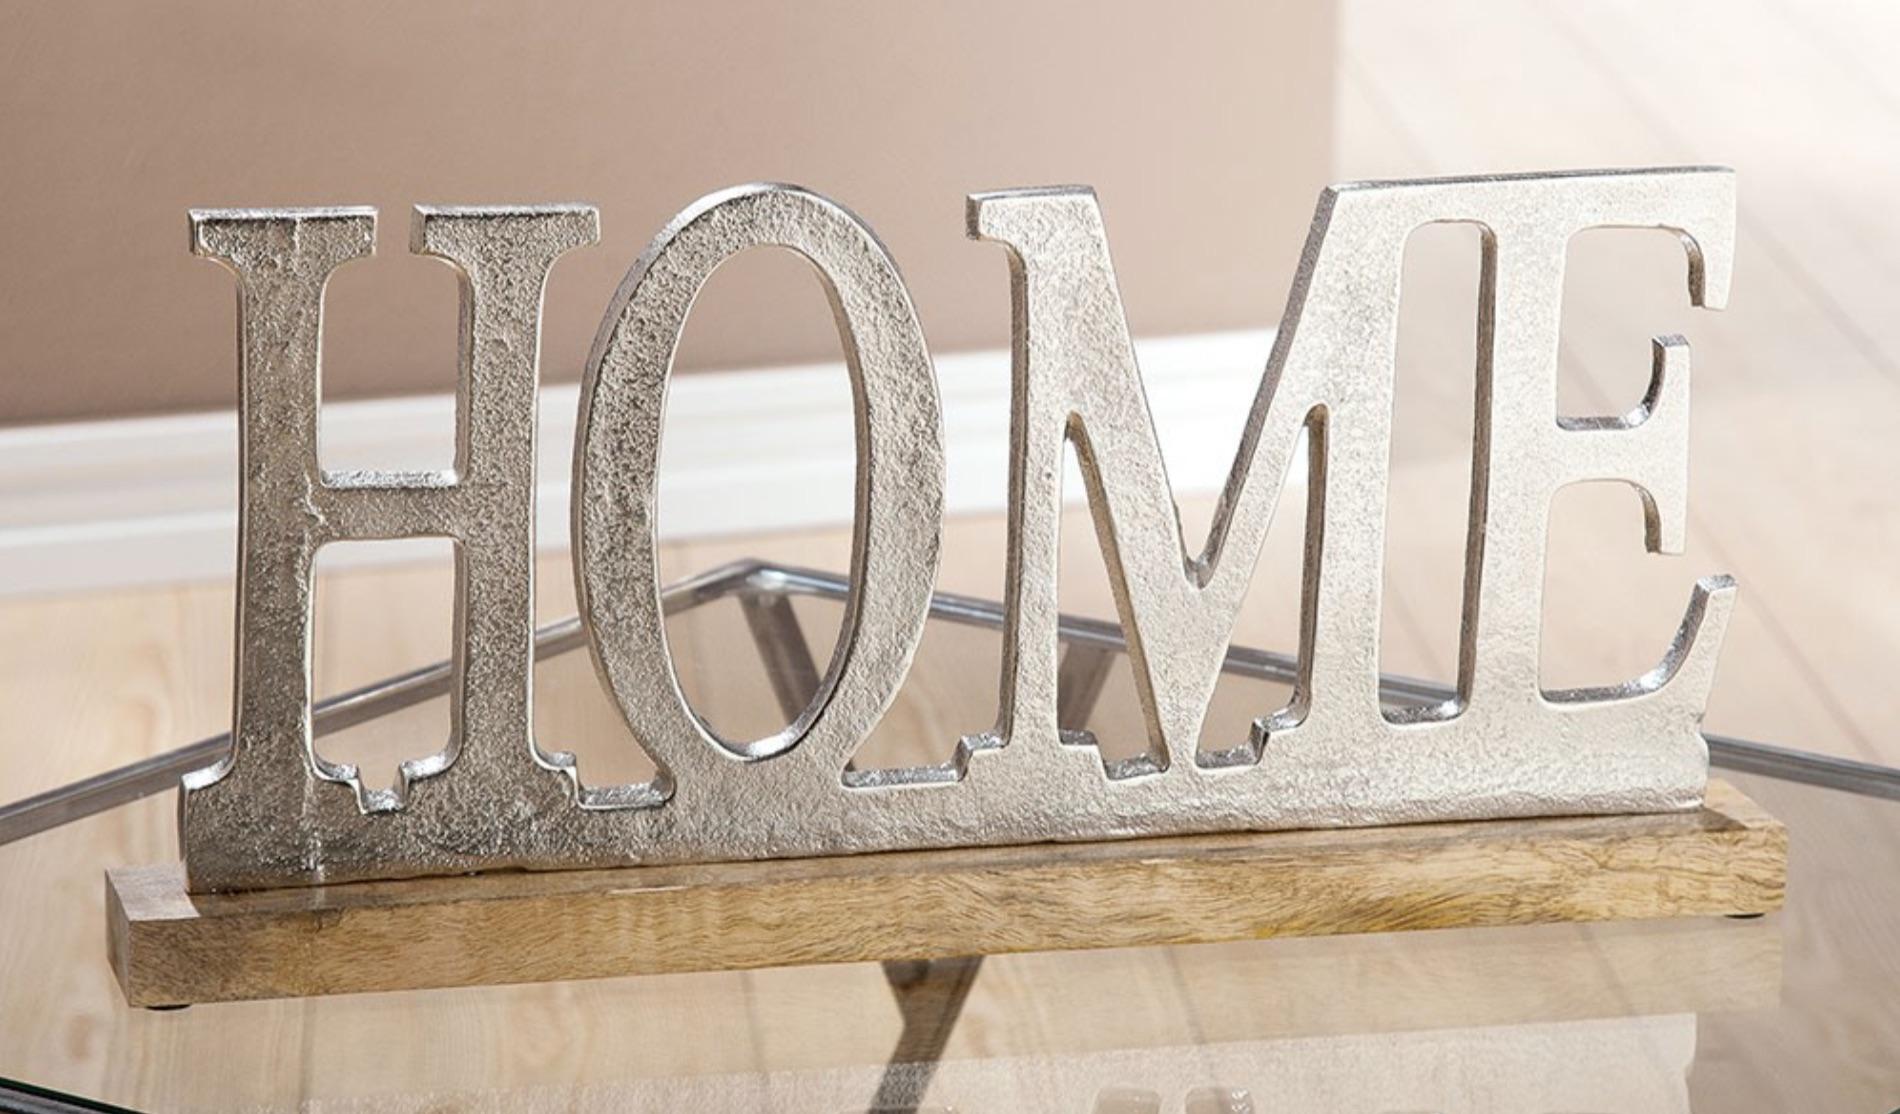 Deko Alu Schriftzug Home Auf Holzbase Silber Mangoholz Living